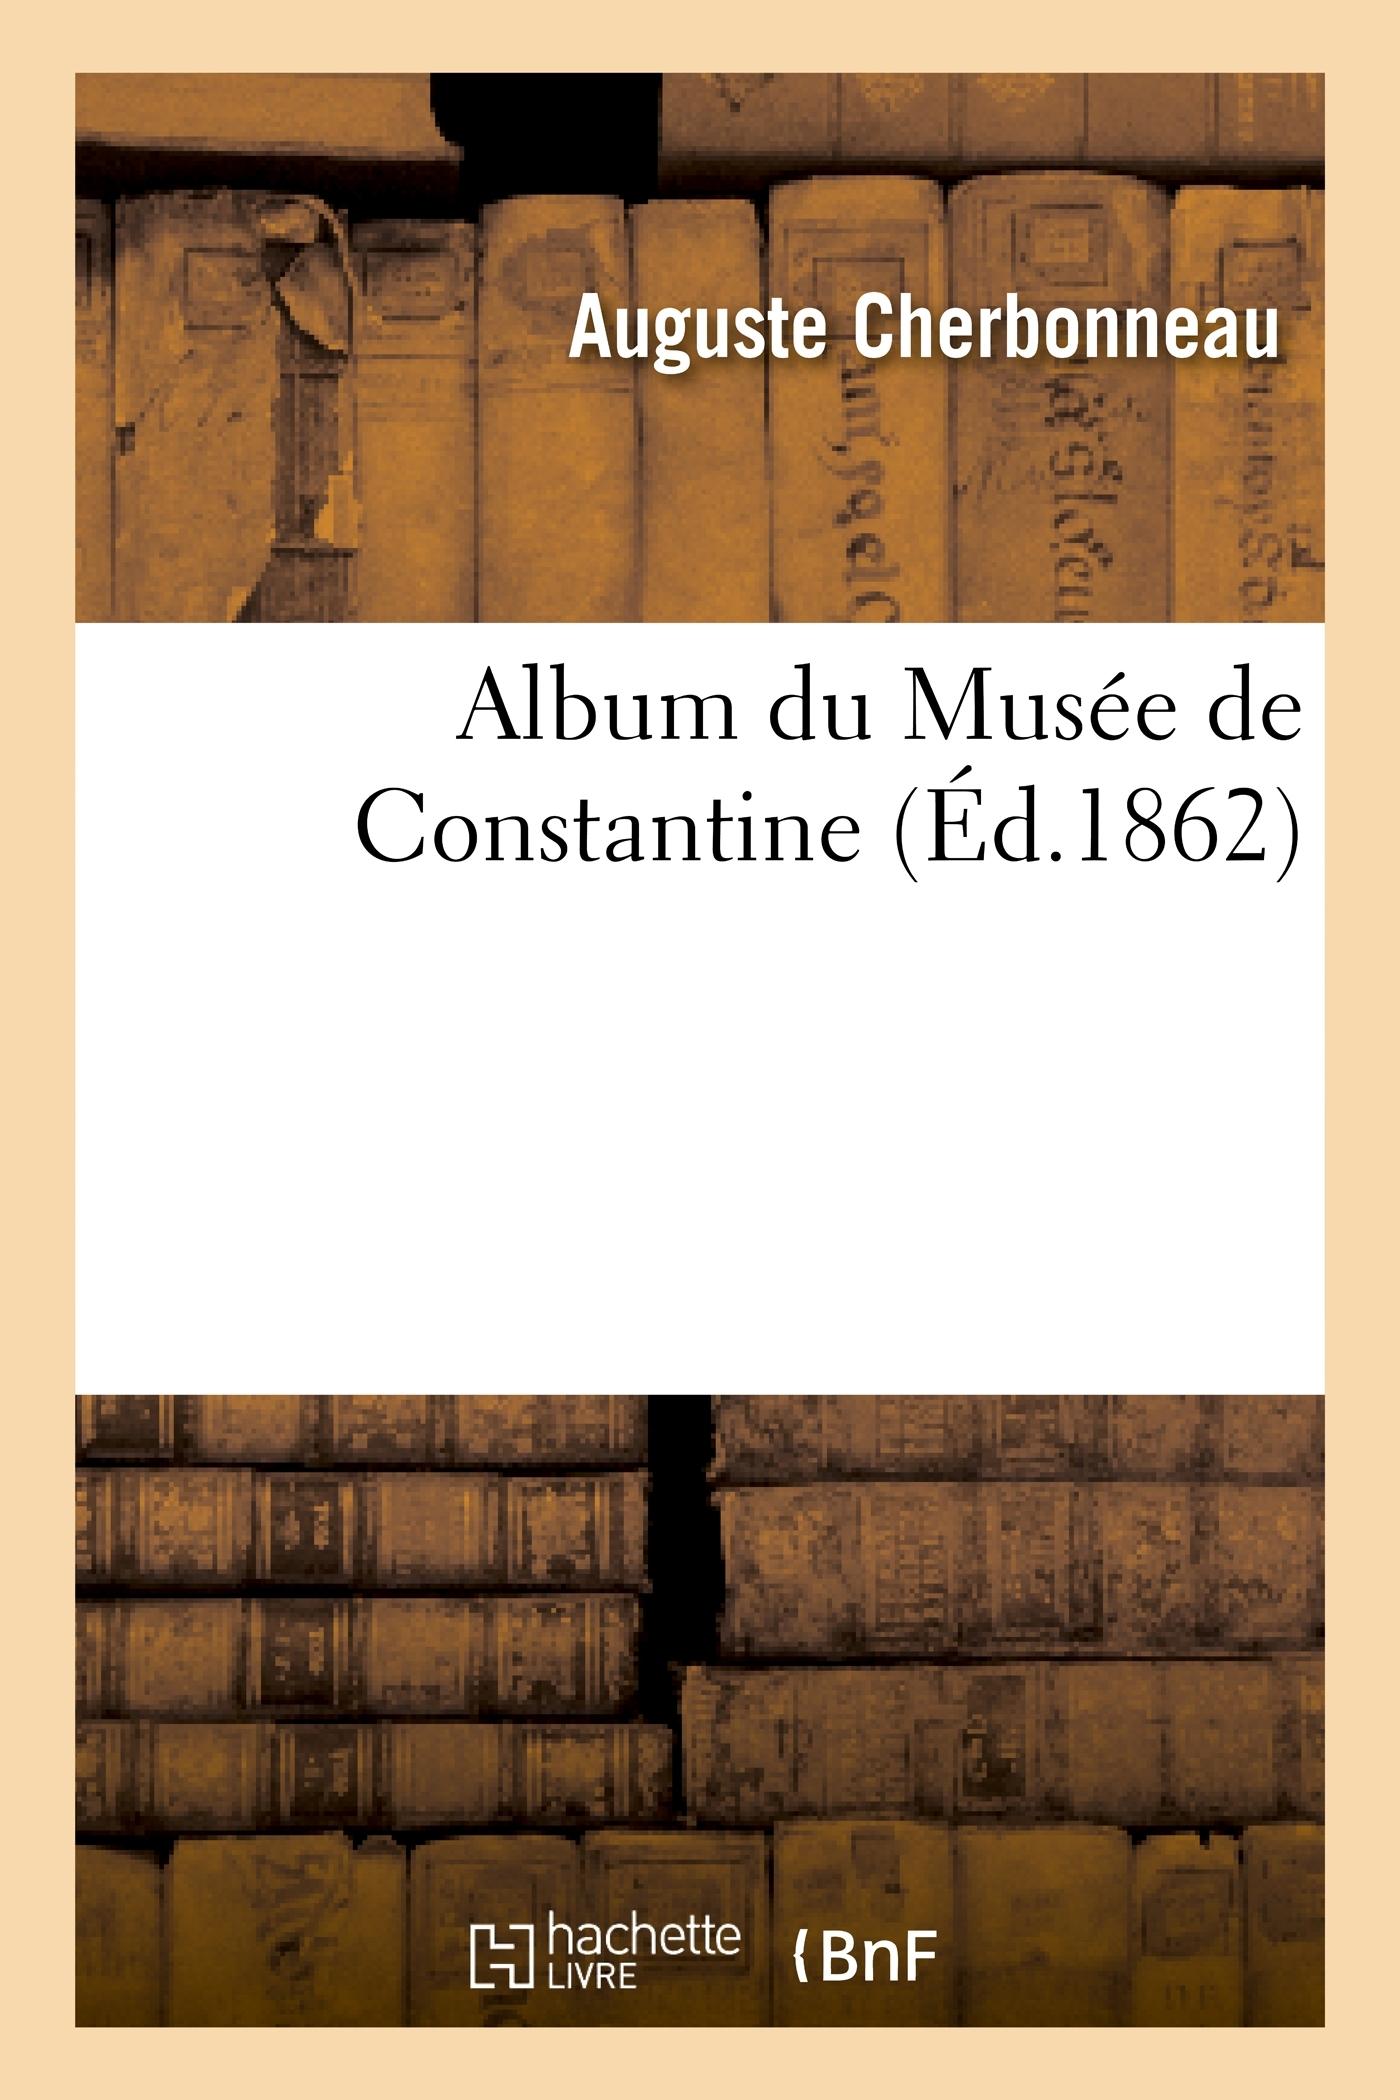 ALBUM DU MUSEE DE CONSTANTINE